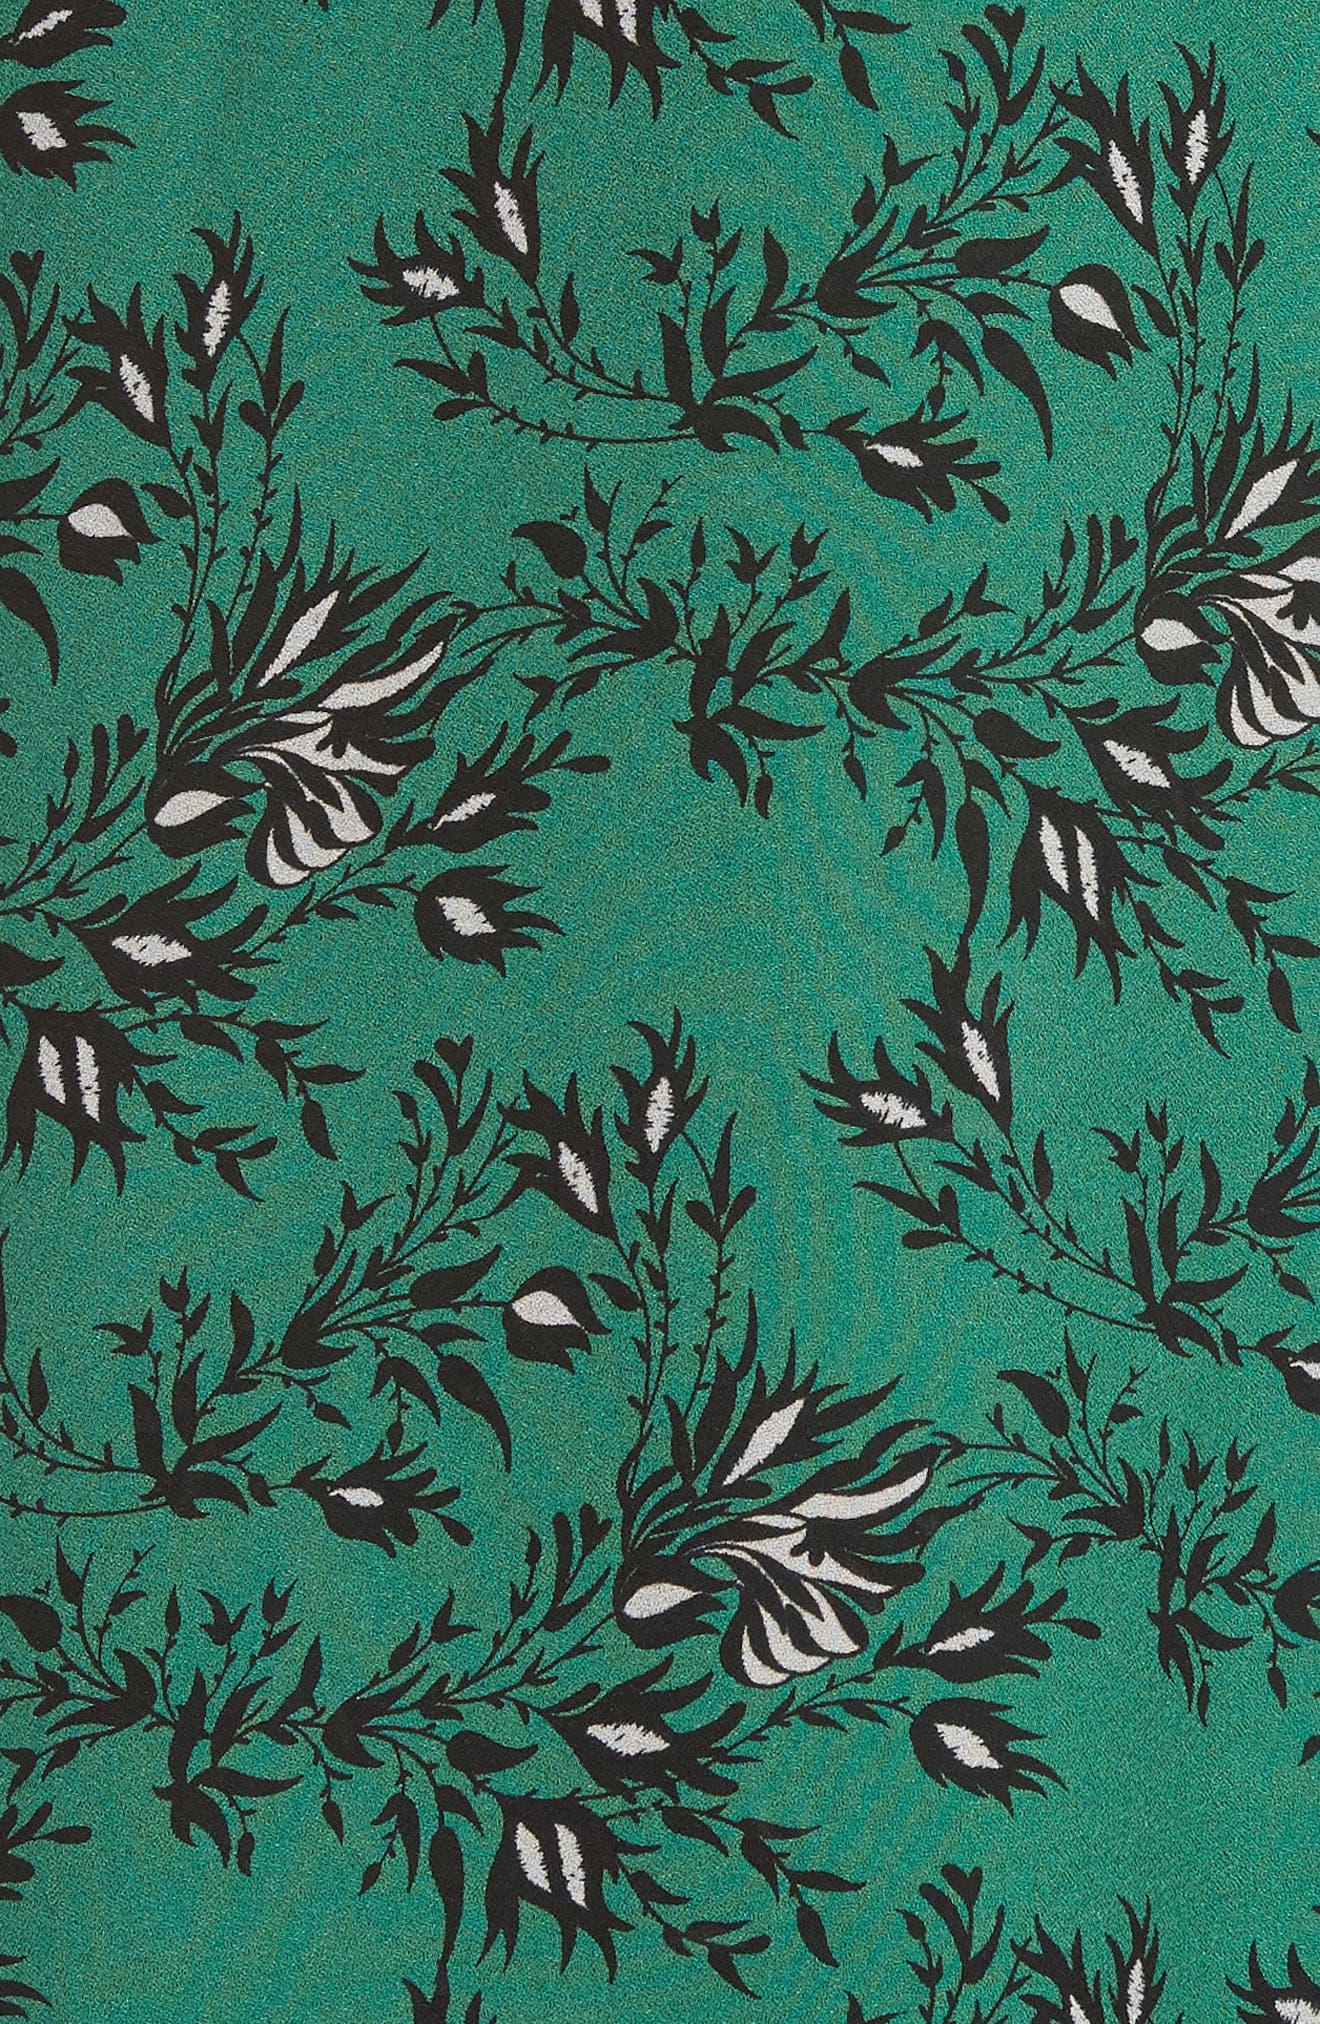 Japanese Floral Midi Dress,                             Alternate thumbnail 5, color,                             EMERALD ORCHID